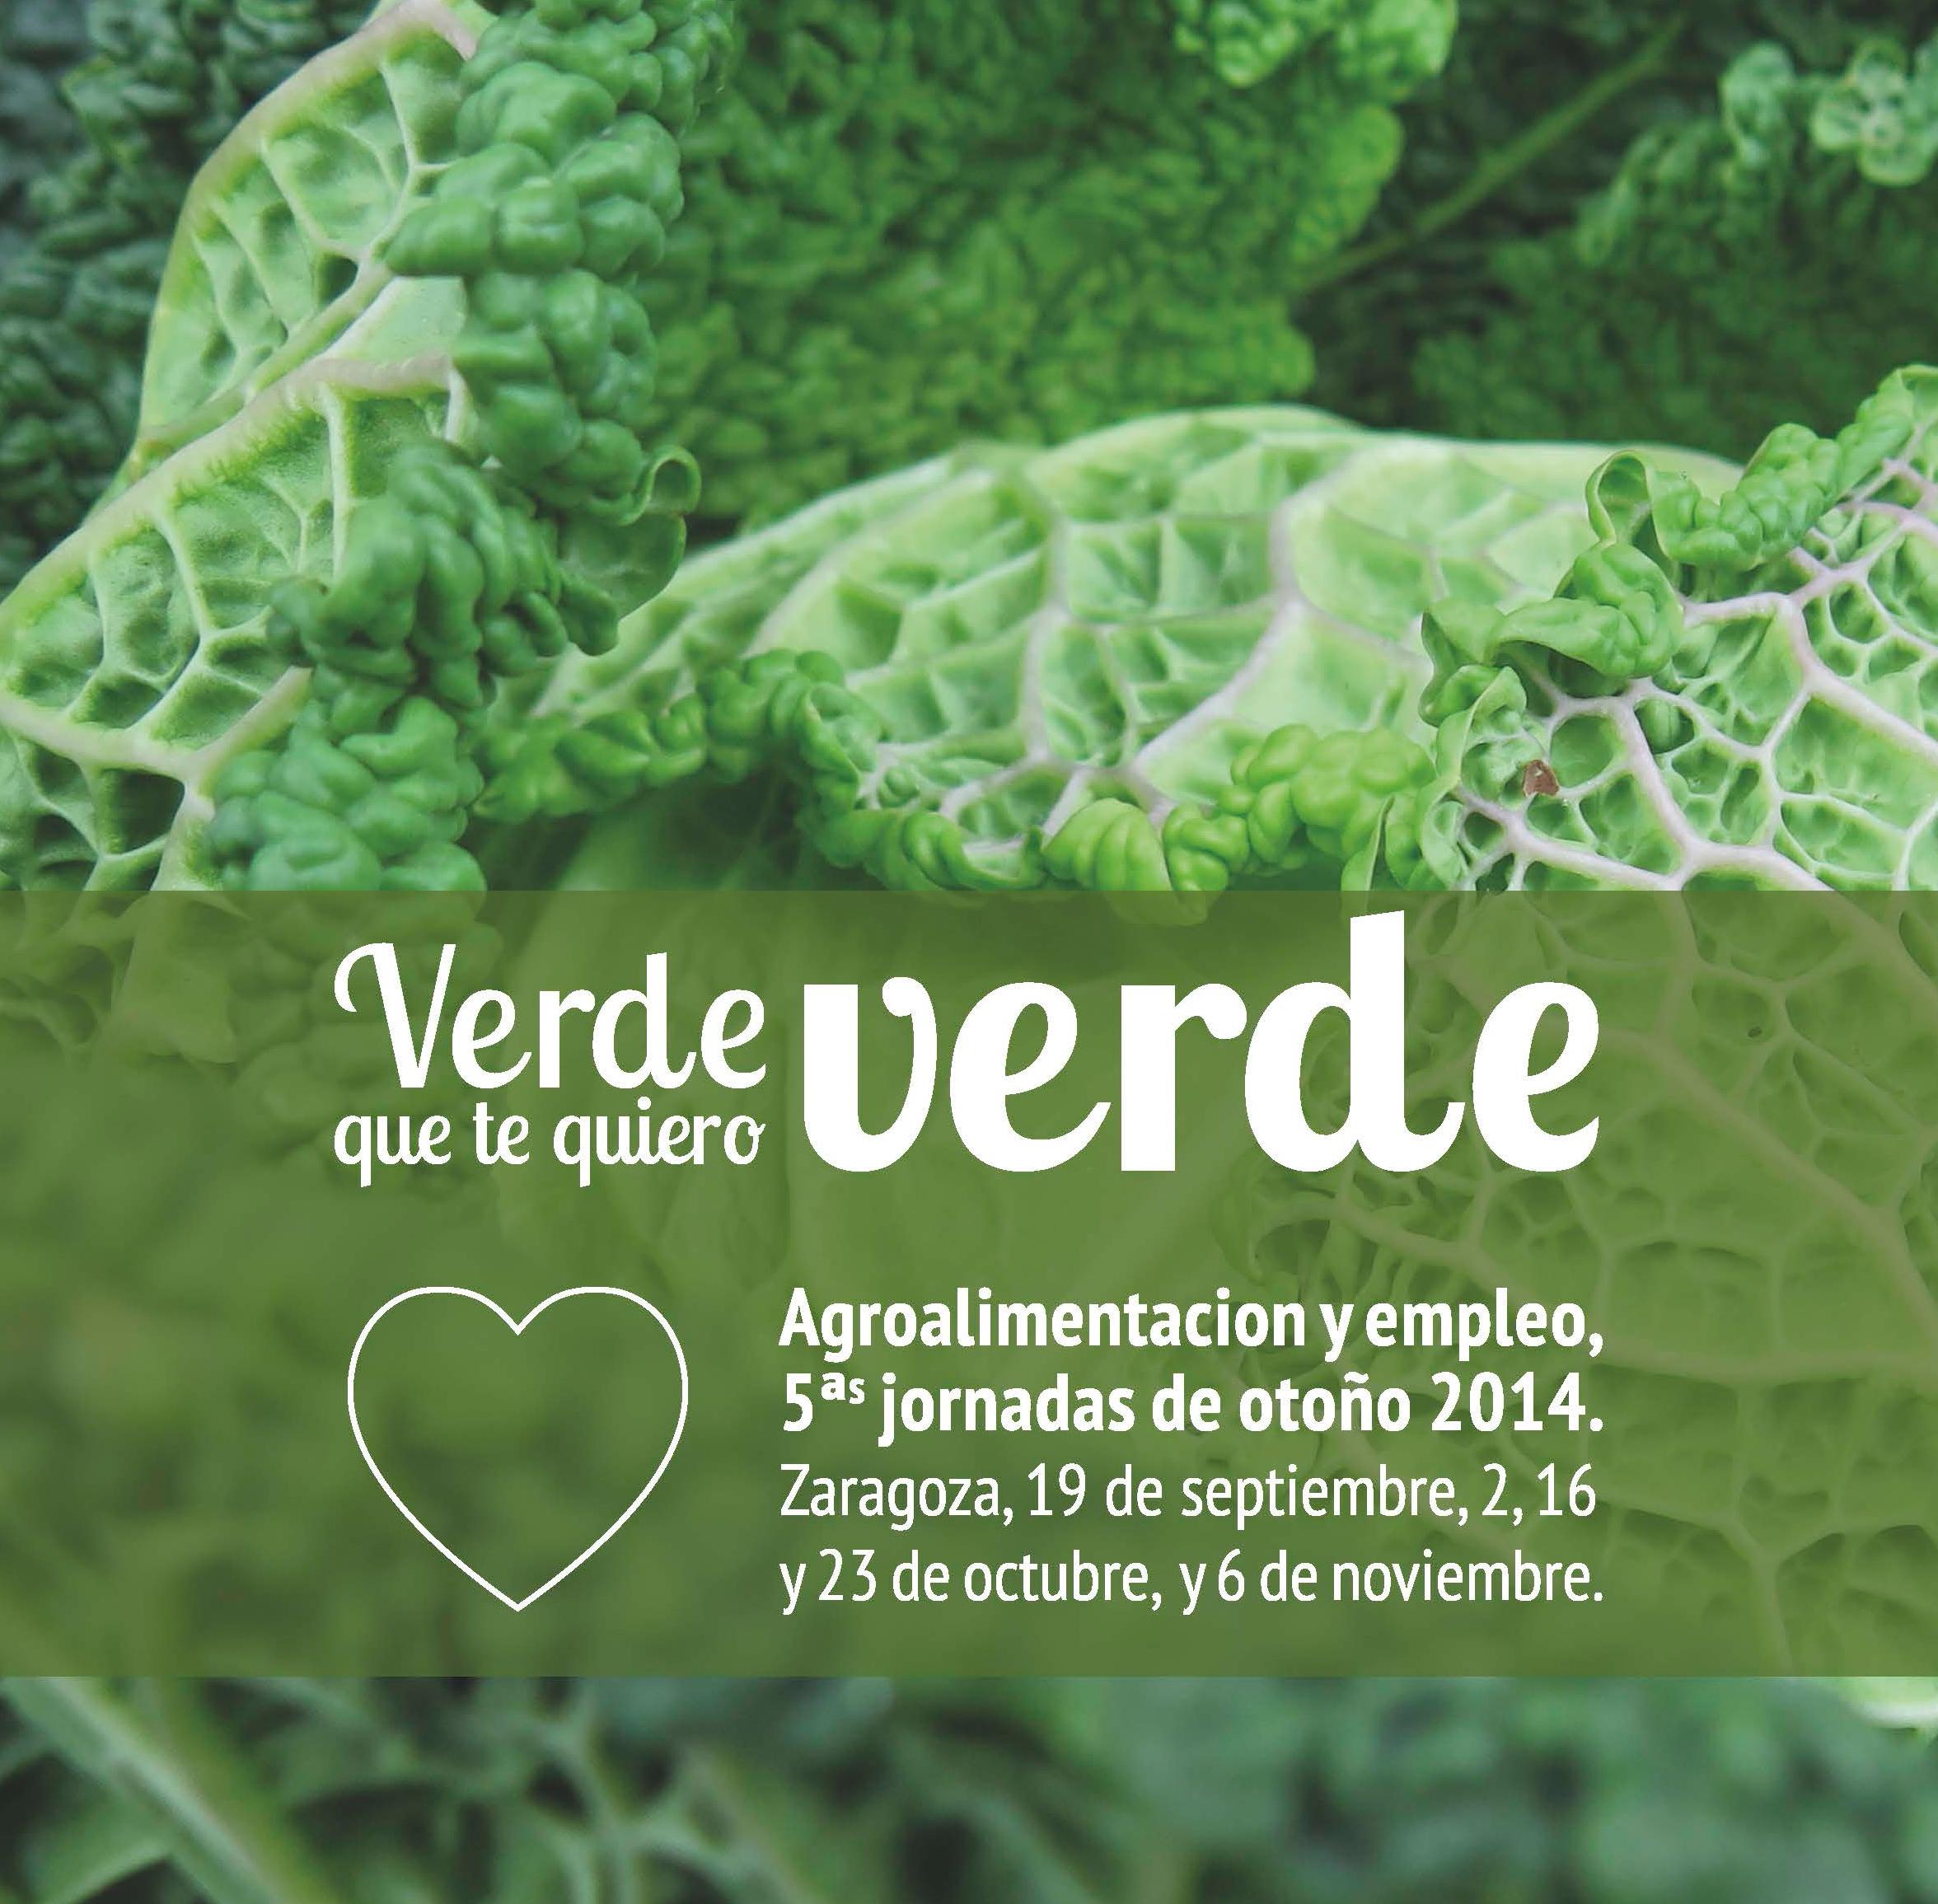 verde que te quiero verde 2014